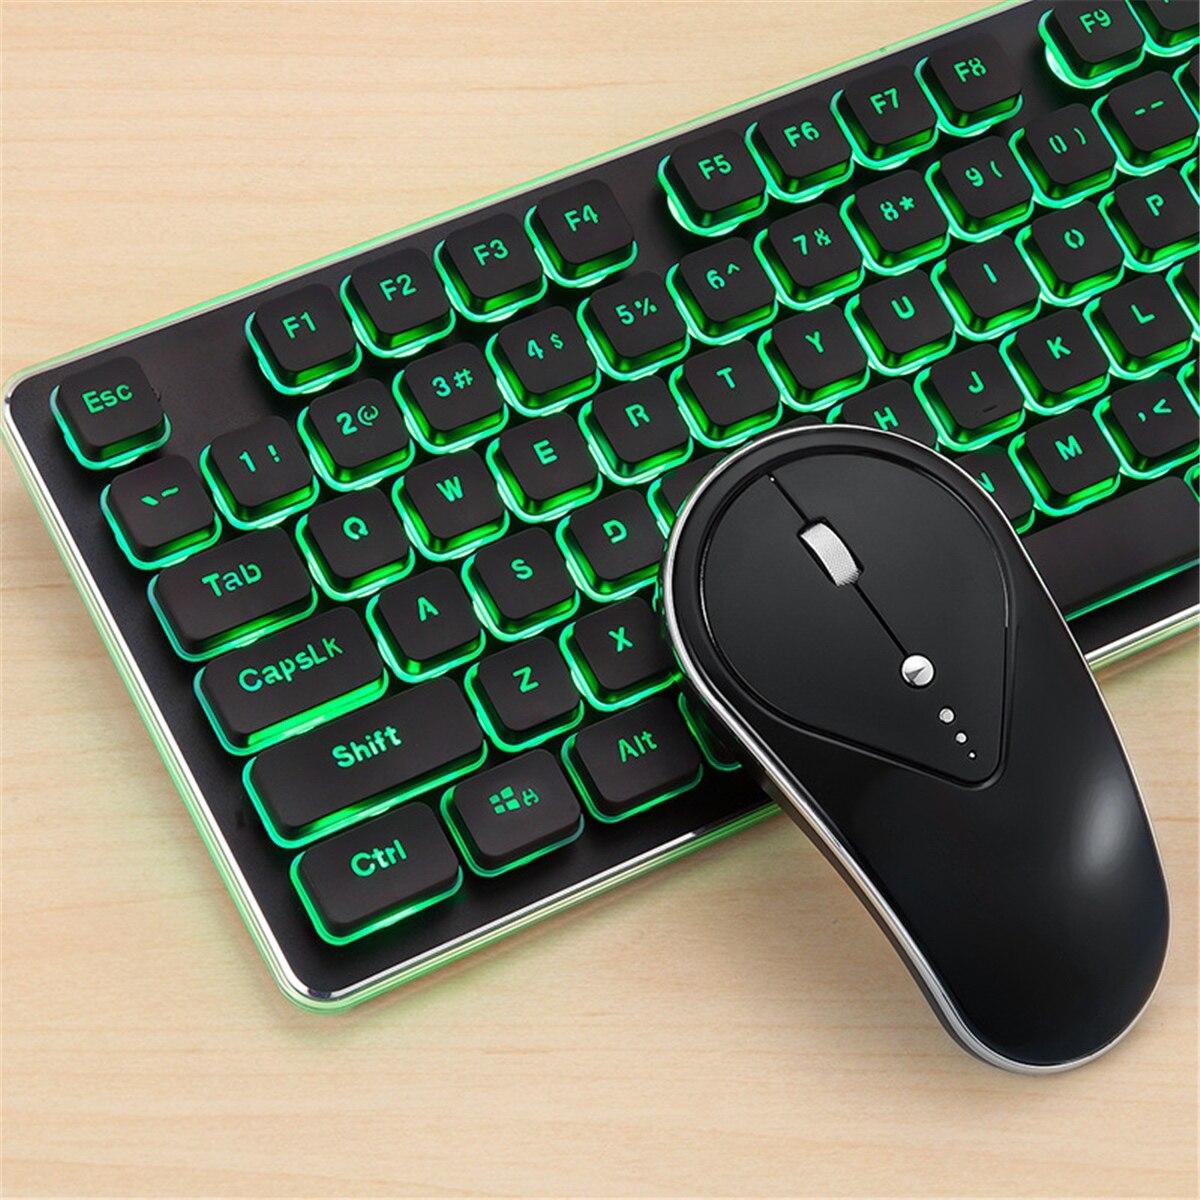 2.4G Wireless Backlit Silent Keyboard and Mouse Combo For PS4 Home Office Laptop Desktop Ergonomic Waterproof Wireless Keyboard, арт. 4000124738977/2, цена 30 $, фото и отзывы